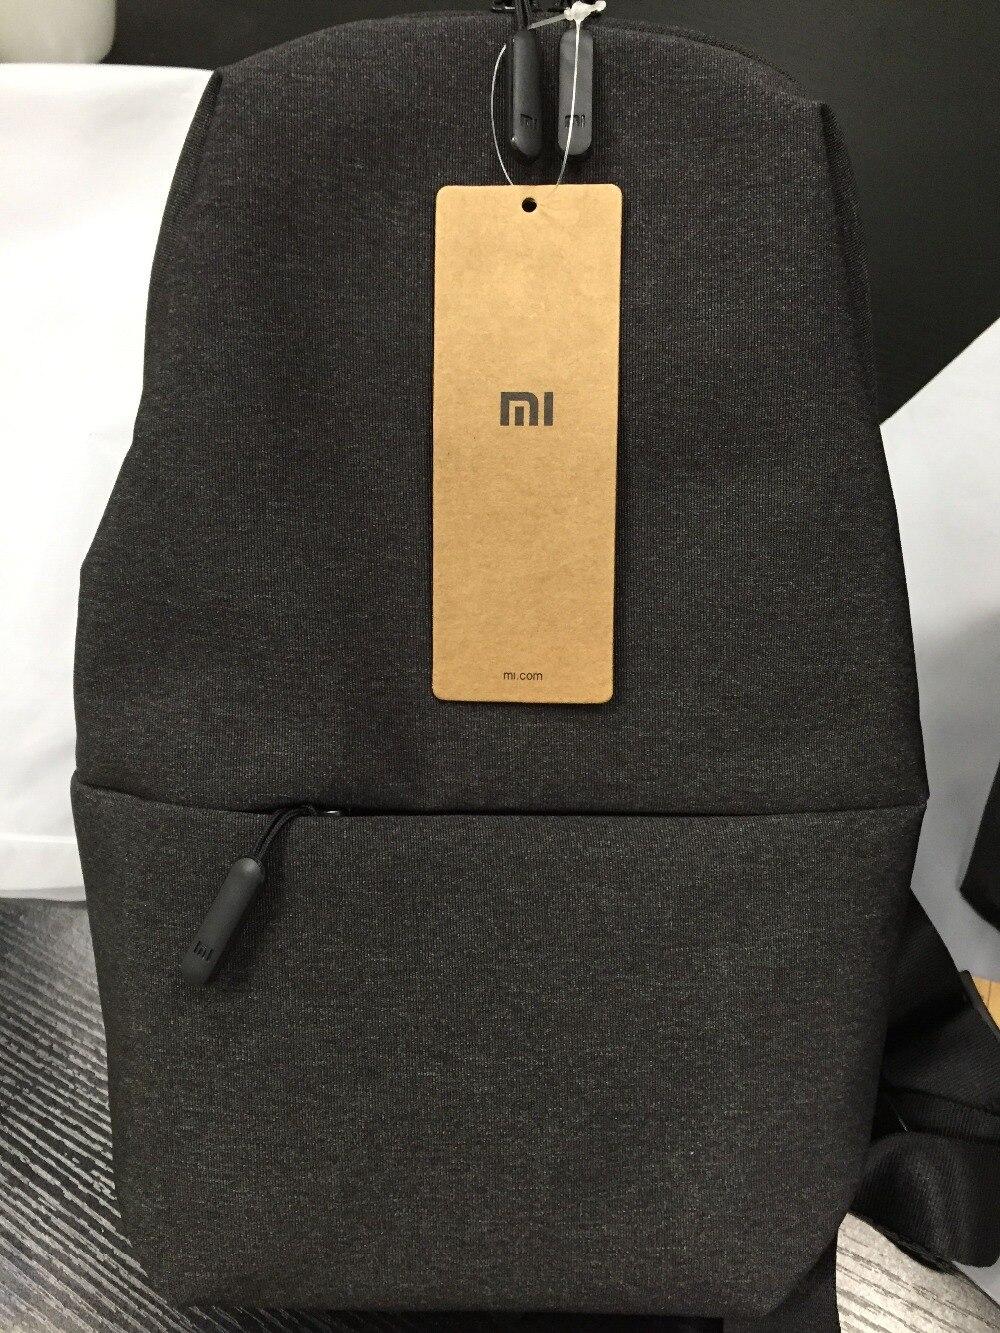 Xiaomi Mi City Sling